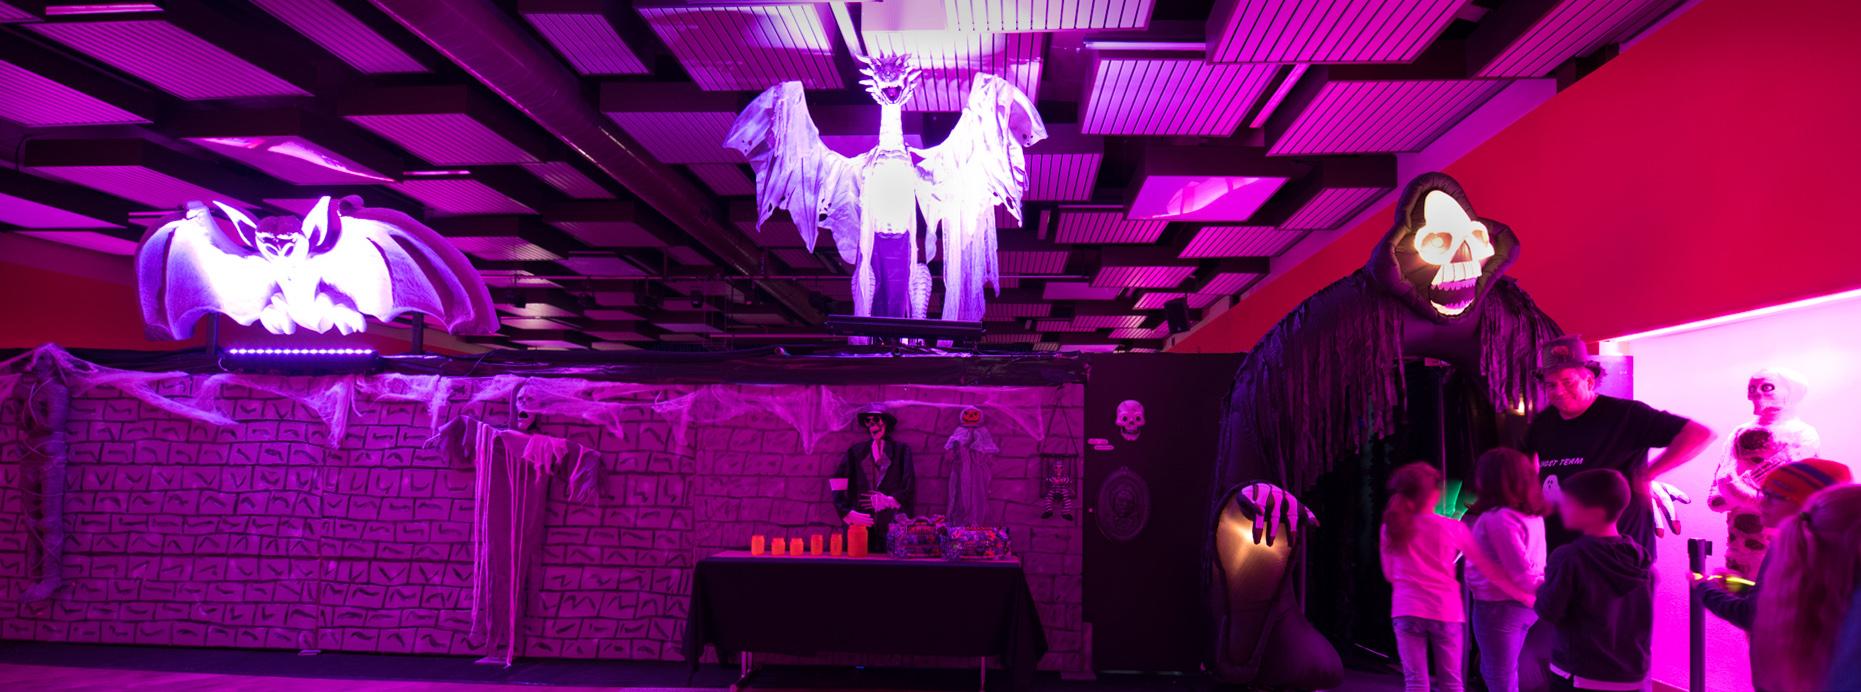 Ghost Hall 2018 du Ghost Team: Paul Biver, Christian Losch et Pol Fantin 5.- 9.11.2018